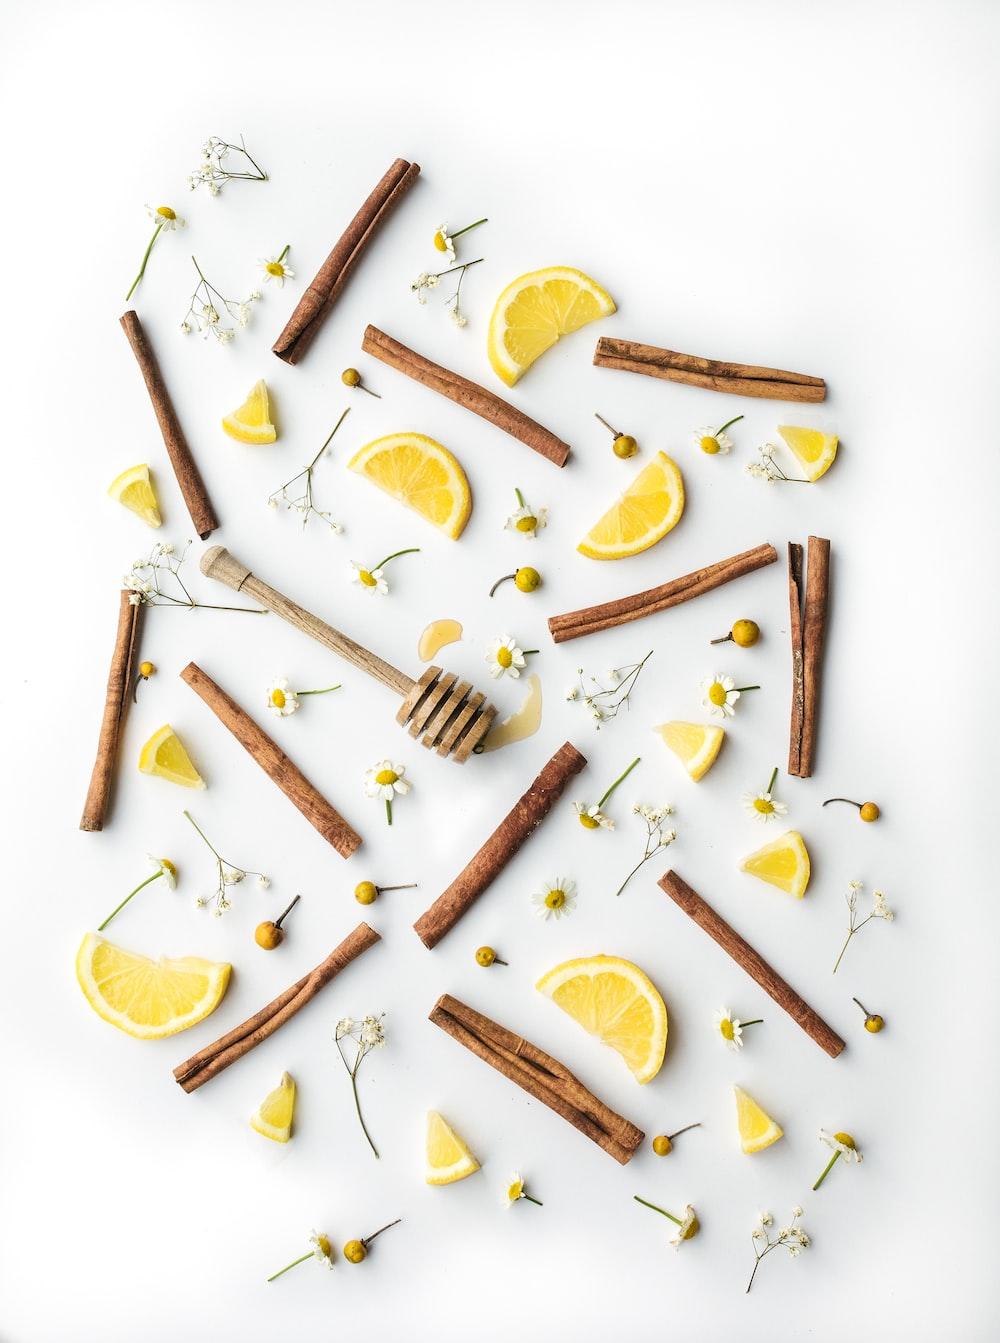 brown sticks and slices of lemons